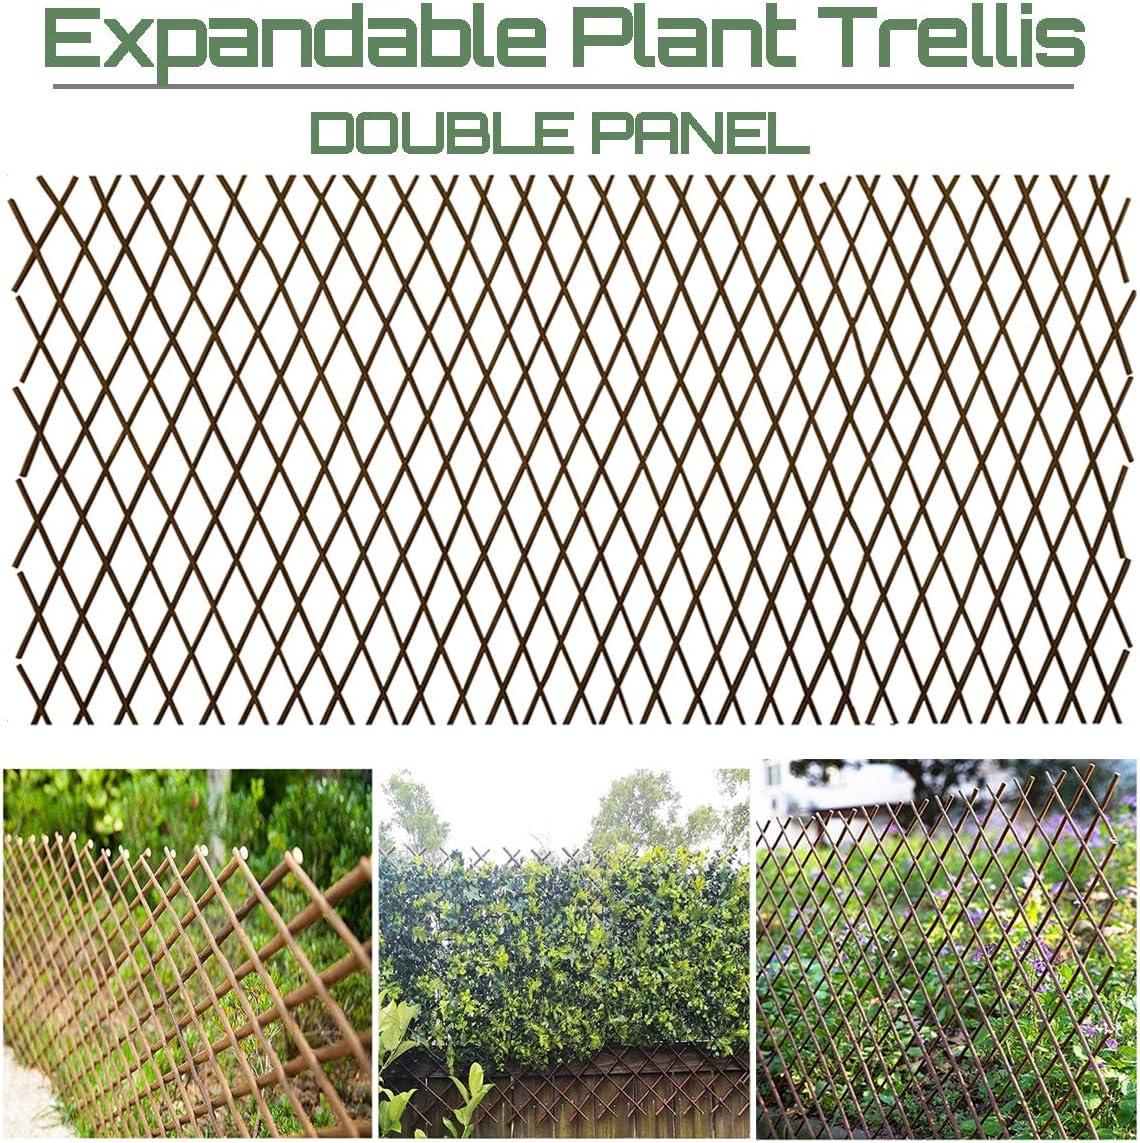 Ralph Willow TrellisFence Expandable Garden Climbing Lattices Trellis Plant for Support Climbing 36x92 Inch (2)